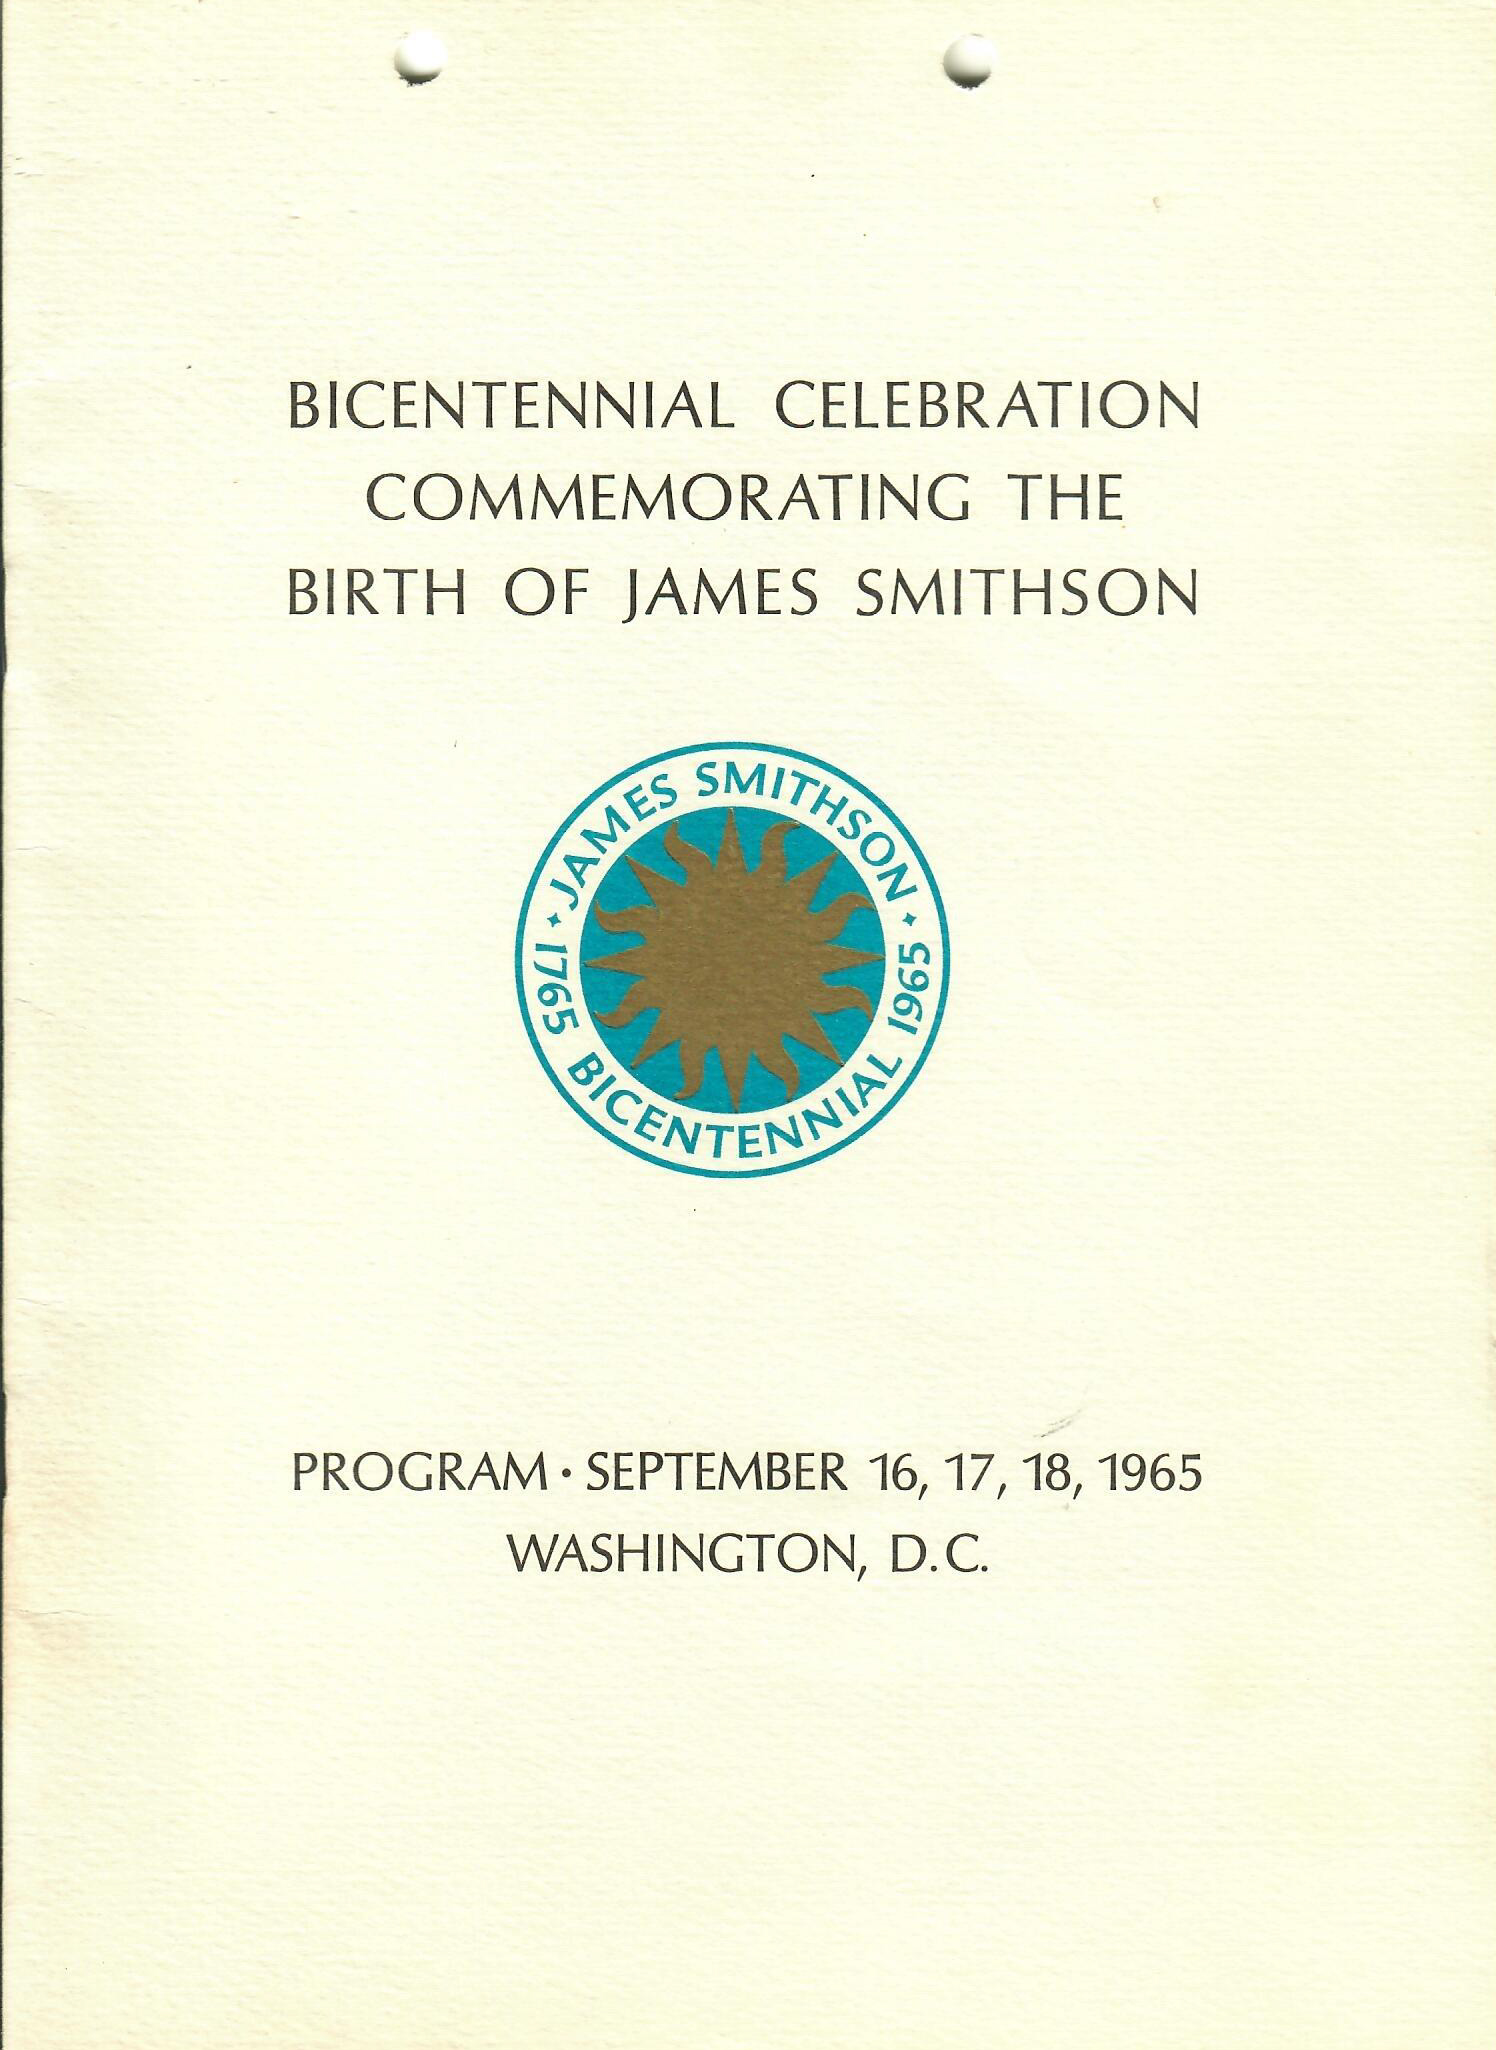 Cover of Bicentennial Celebration program depicting Crimilda's final design for the Bicentennial whi